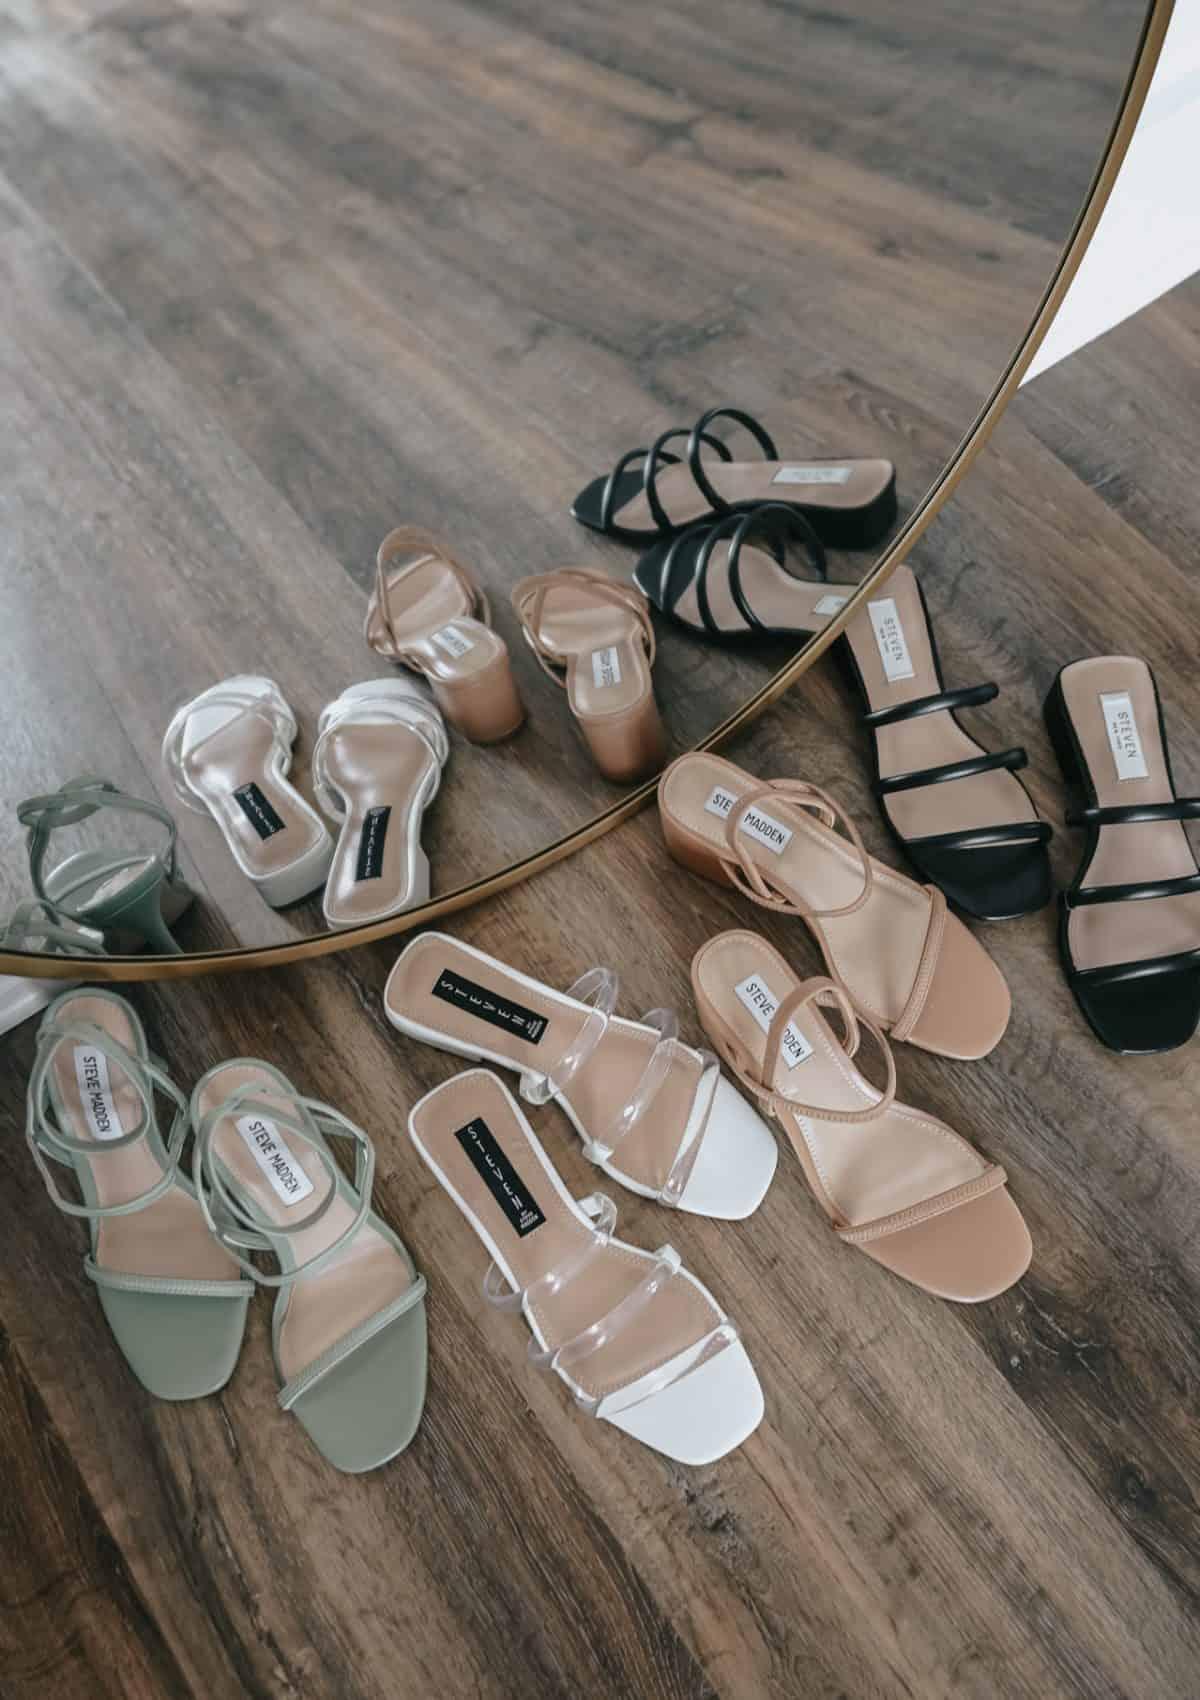 80+ Spring Shoe Favorites Under $50, $100 and $200+